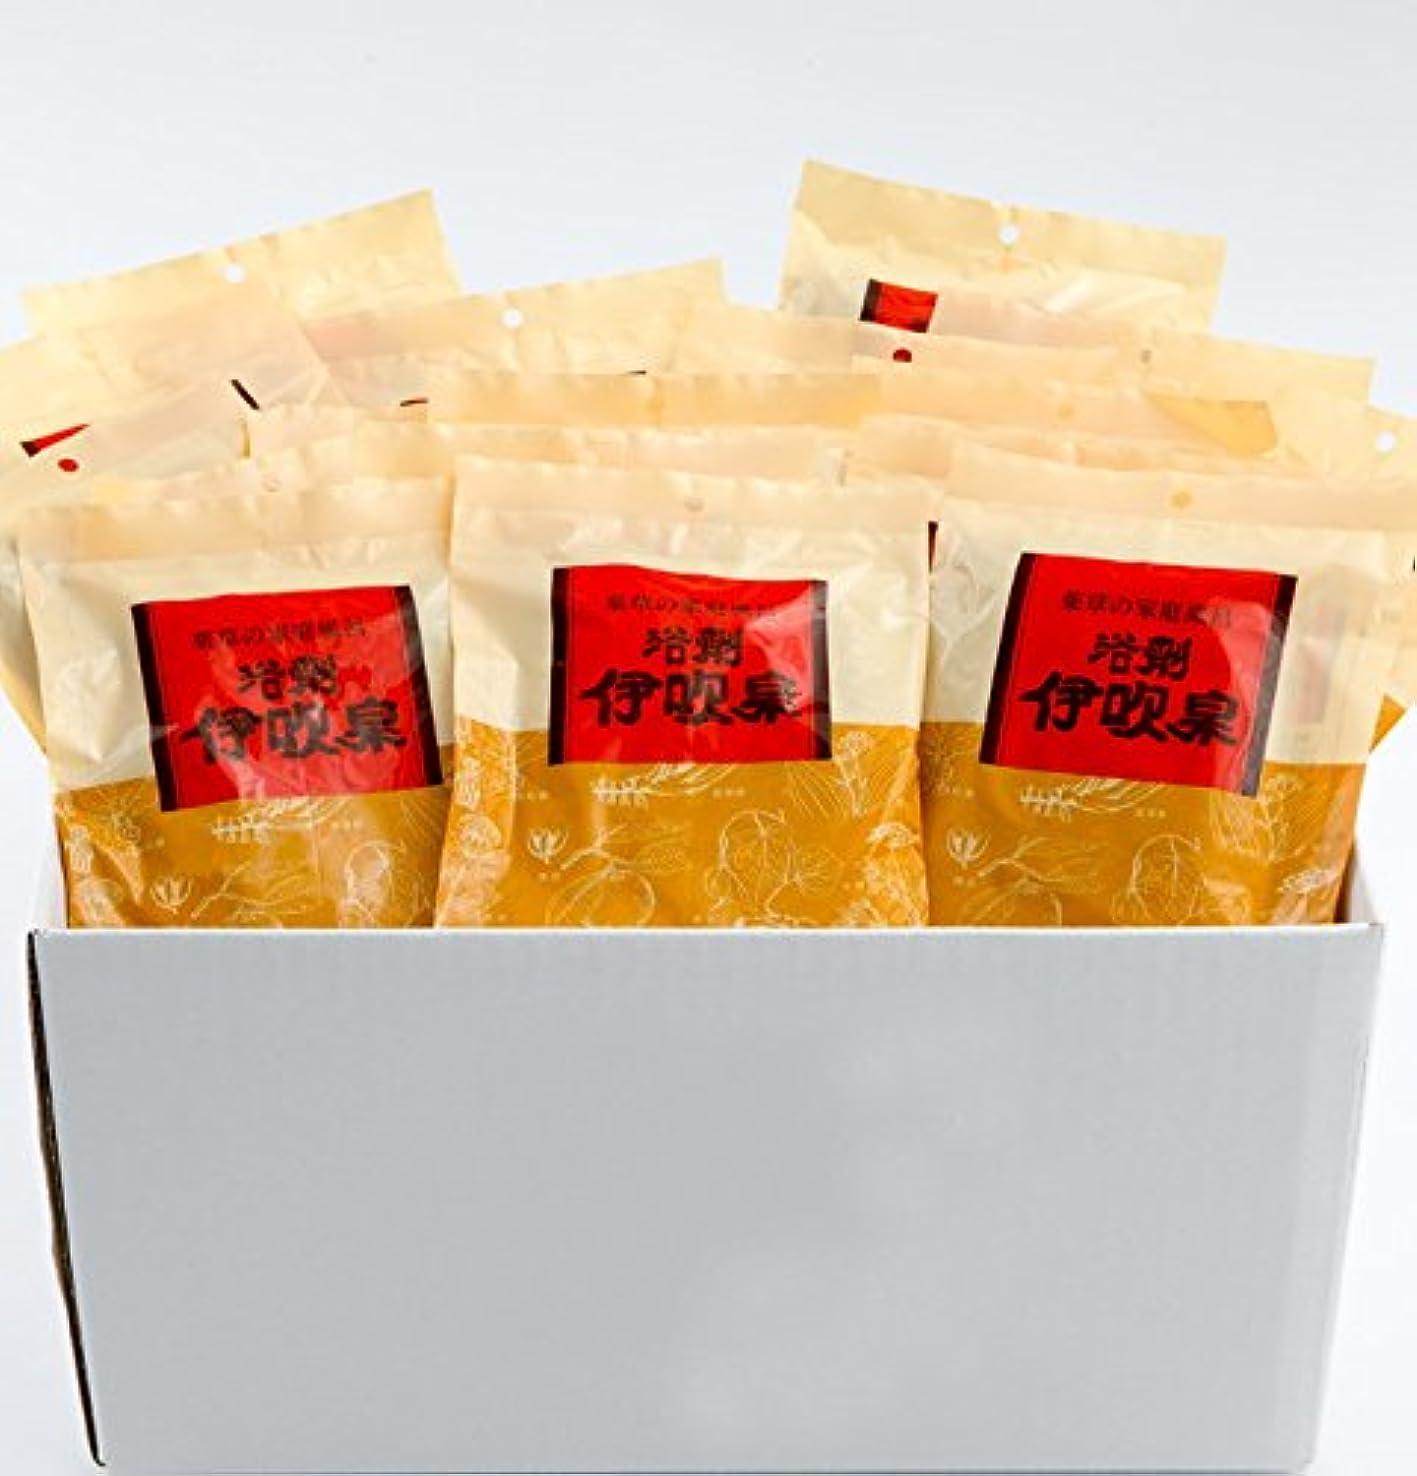 出撃者ウナギ談話浴剤 伊吹泉 ~薬草の家庭風呂~ 16袋(32包)セット